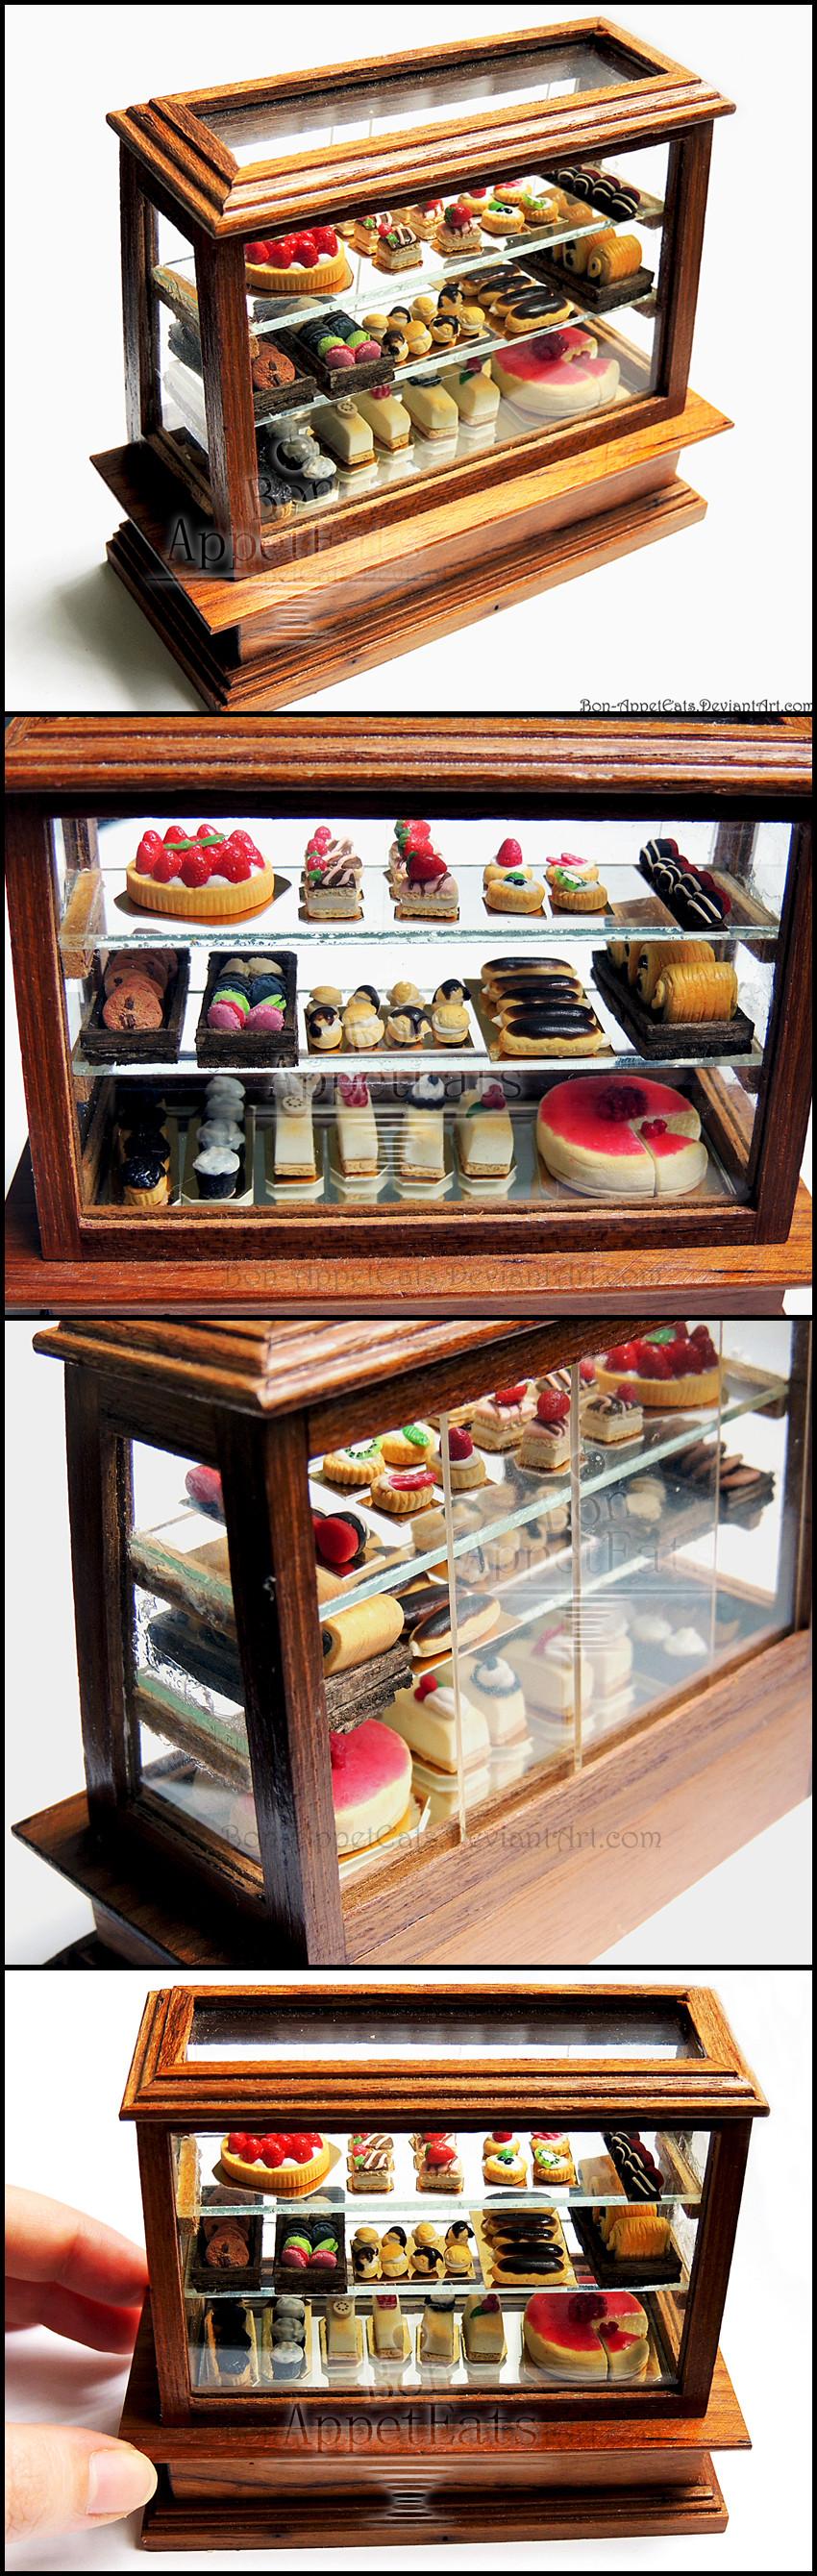 Dessert Display Case  1 12 Pastry Display Case Detail by Bon AppetEats on DeviantArt